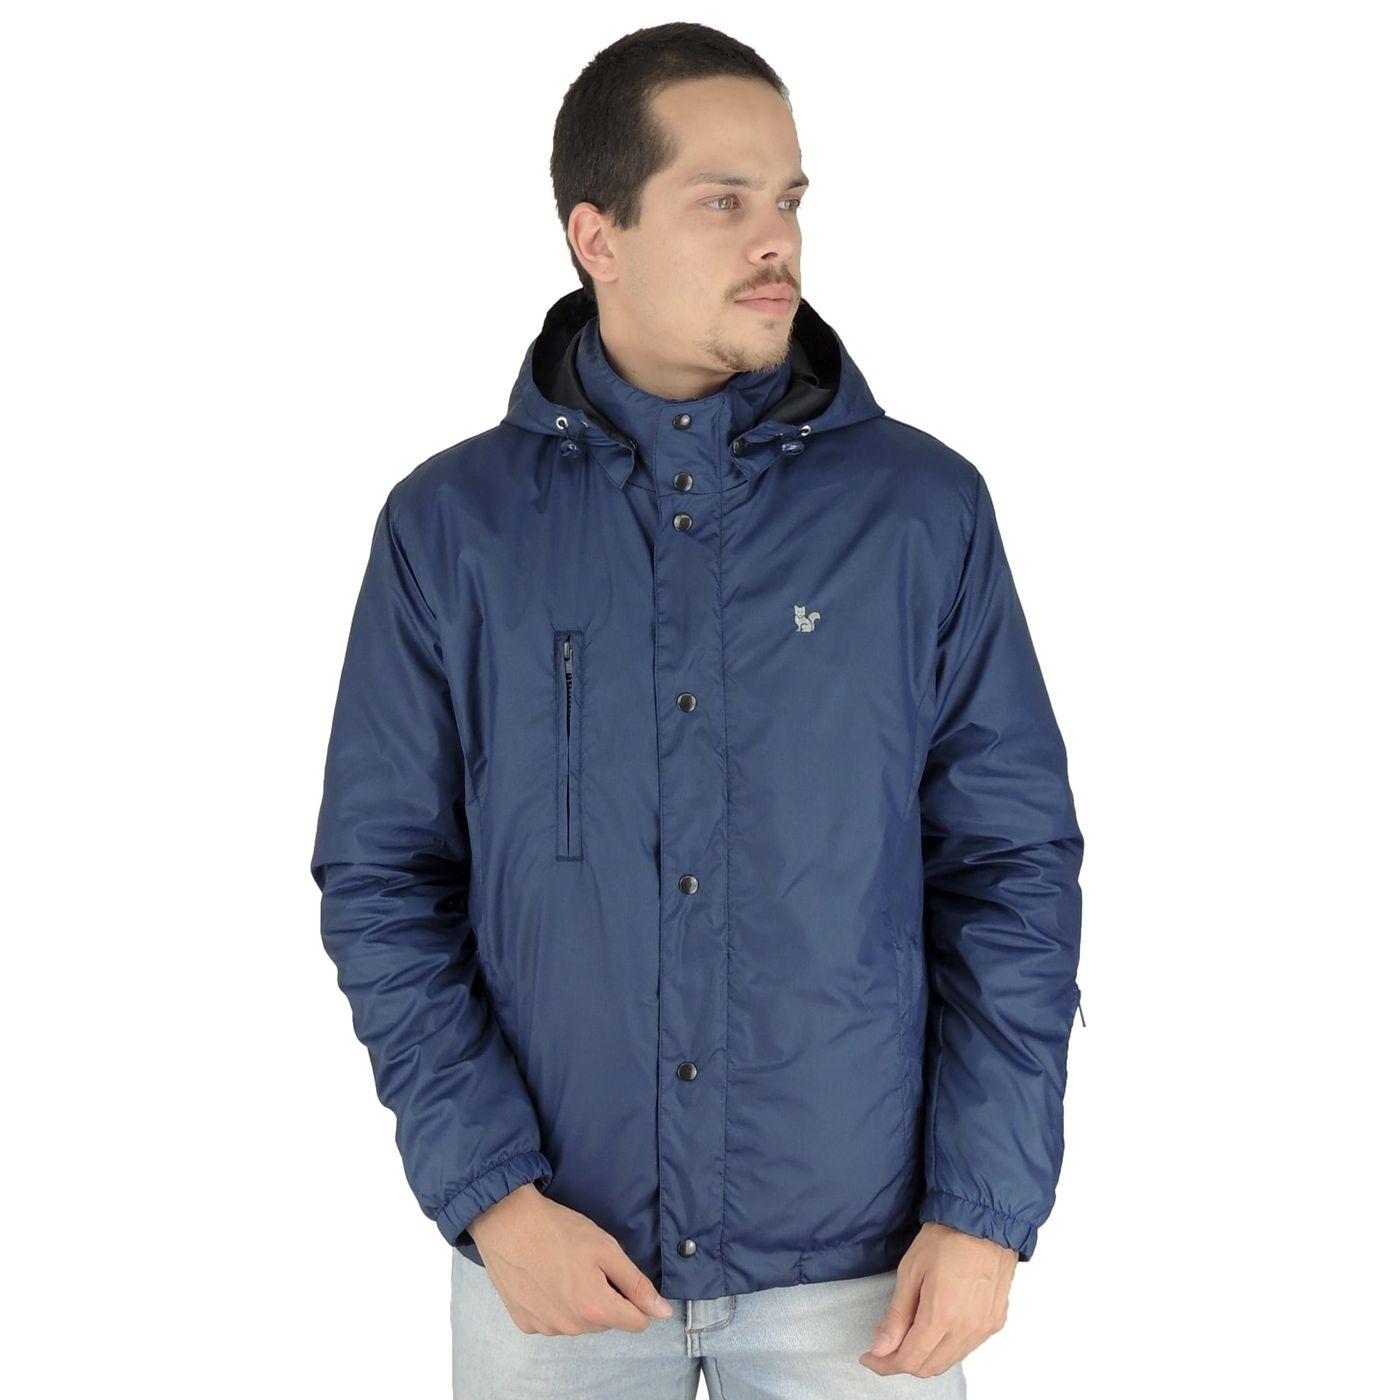 f09103d51 Jaqueta térmica masculina 3 em 1 para neve e frio intenso - fieroshop